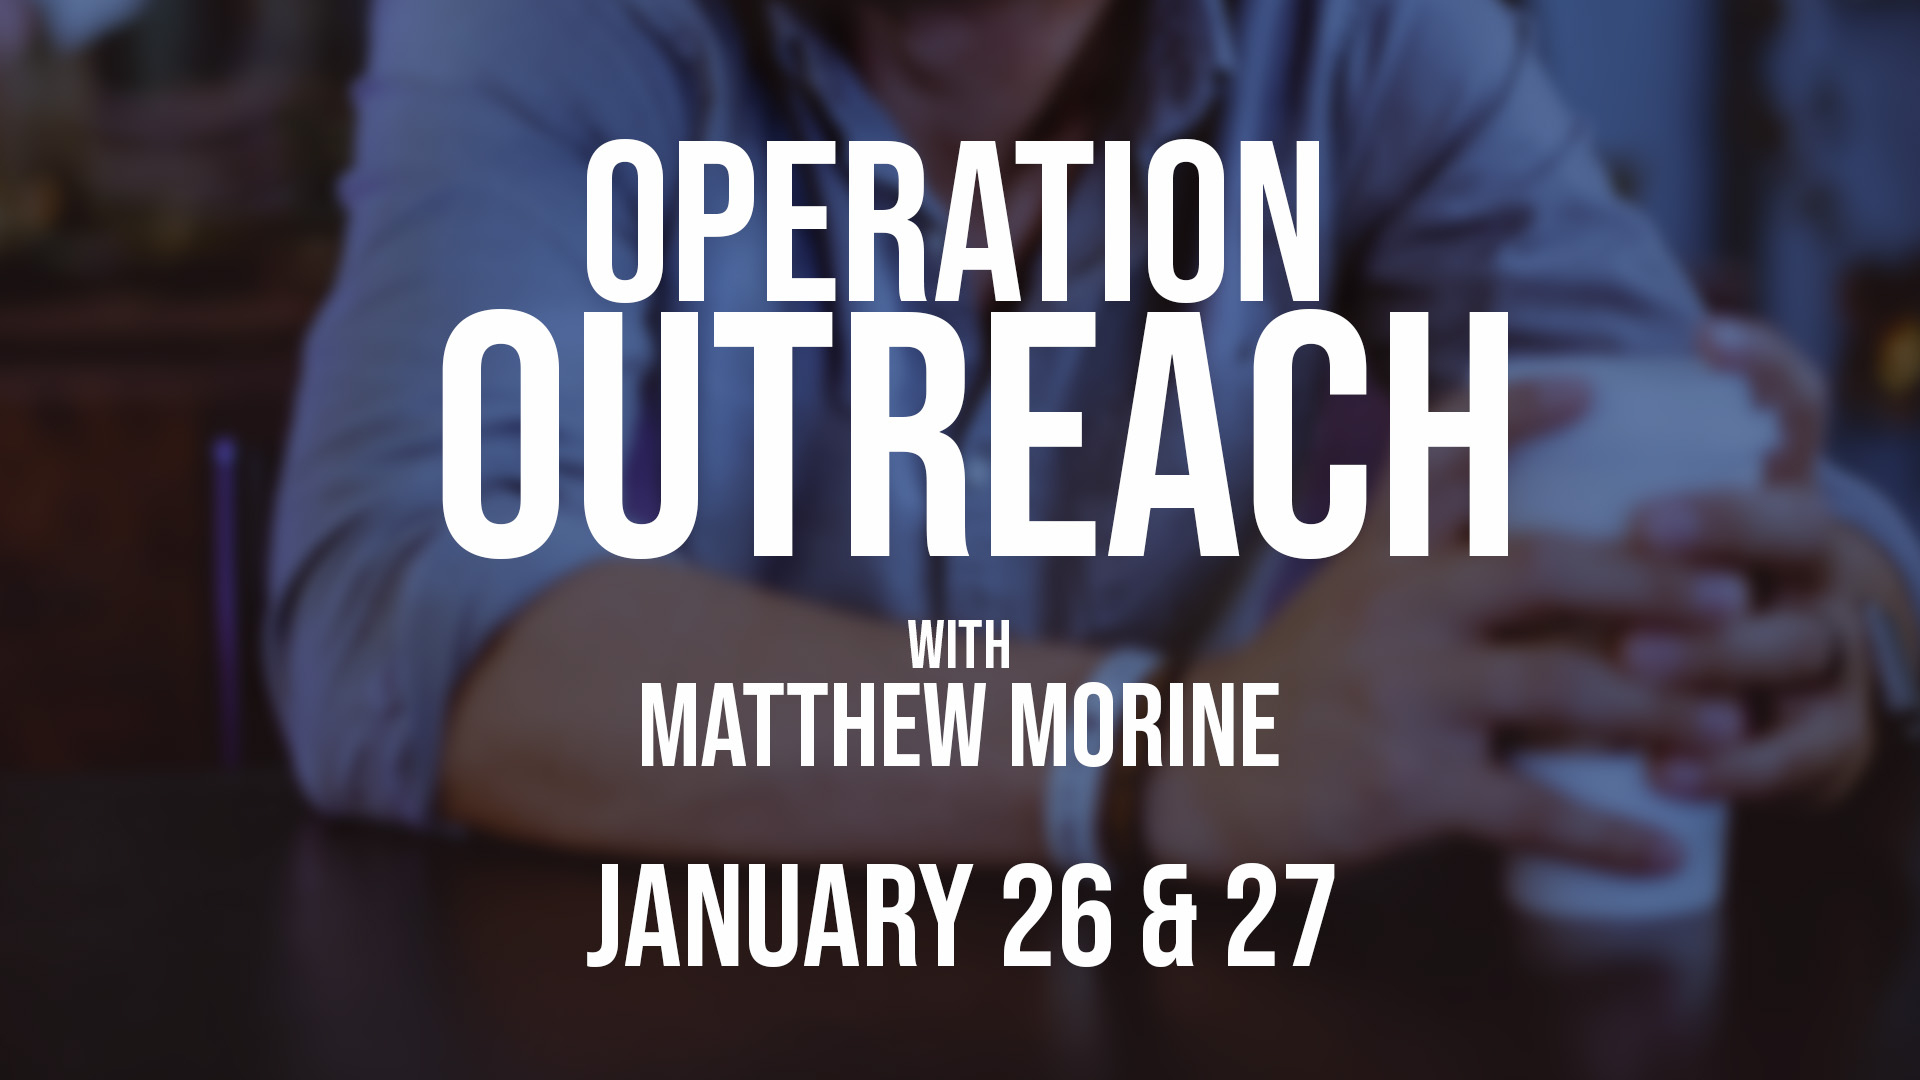 OperationOutreach.jpg